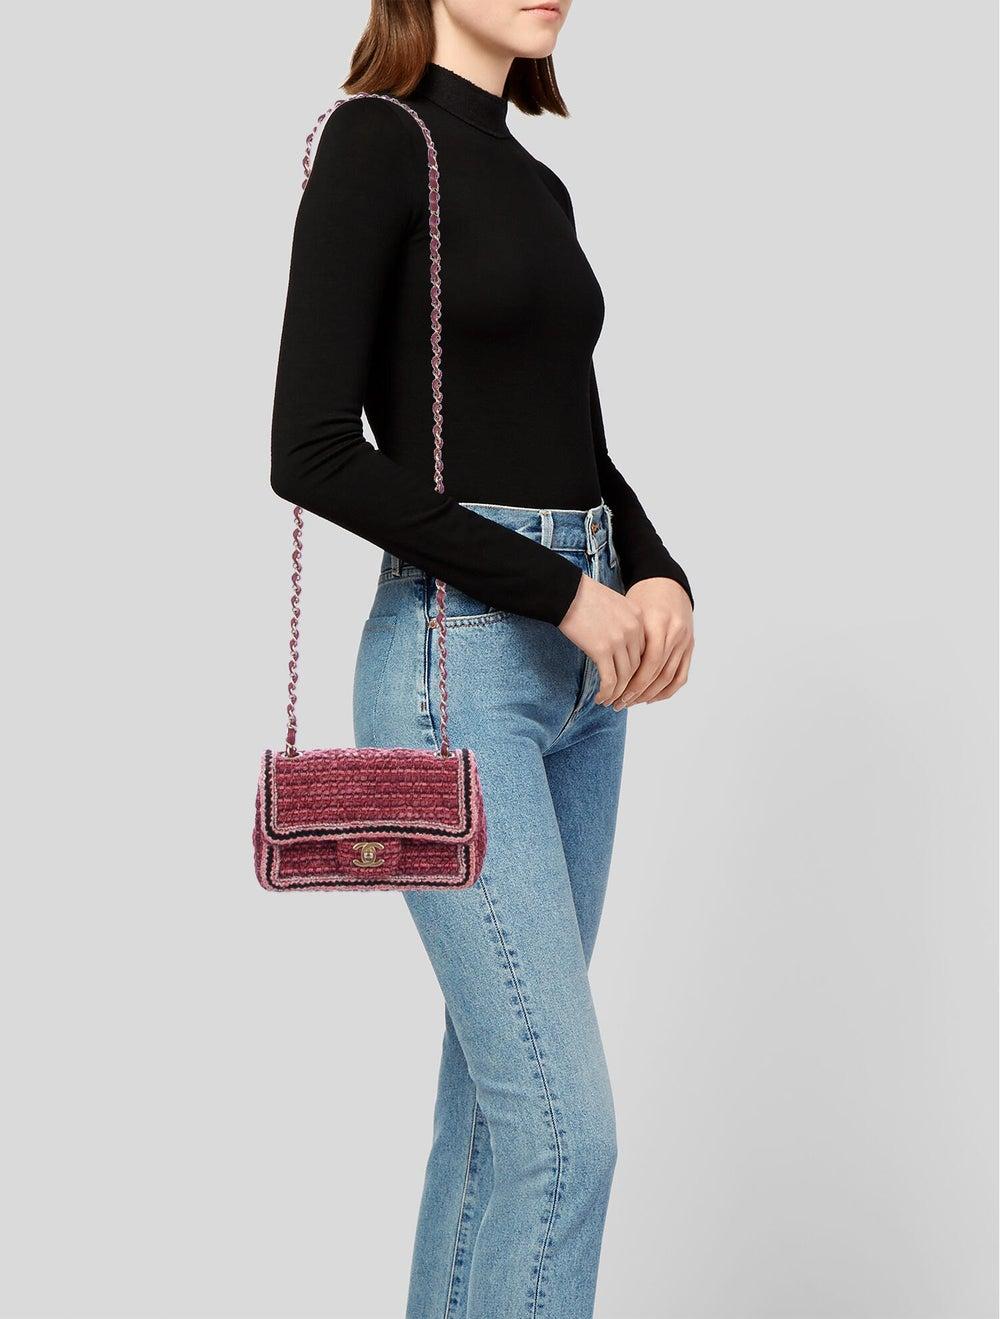 Chanel Tweed Braid Mini Flap Bag Red - image 2